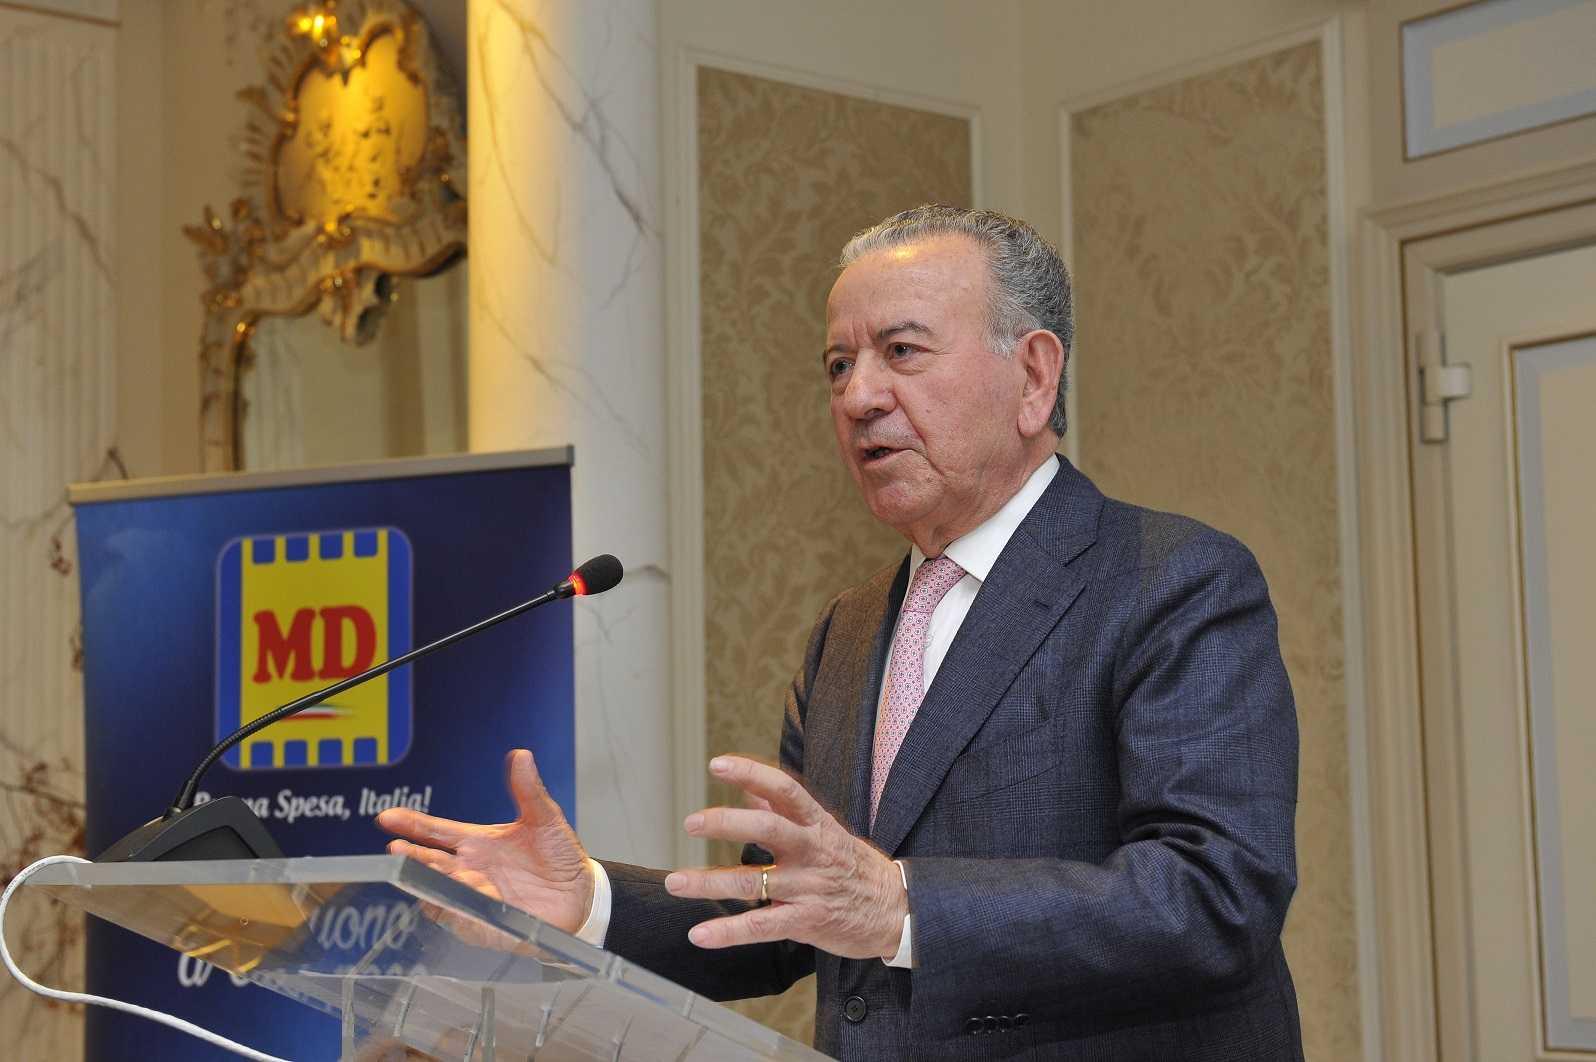 Cav Patrizio Podini Presidente MD S.p.A.